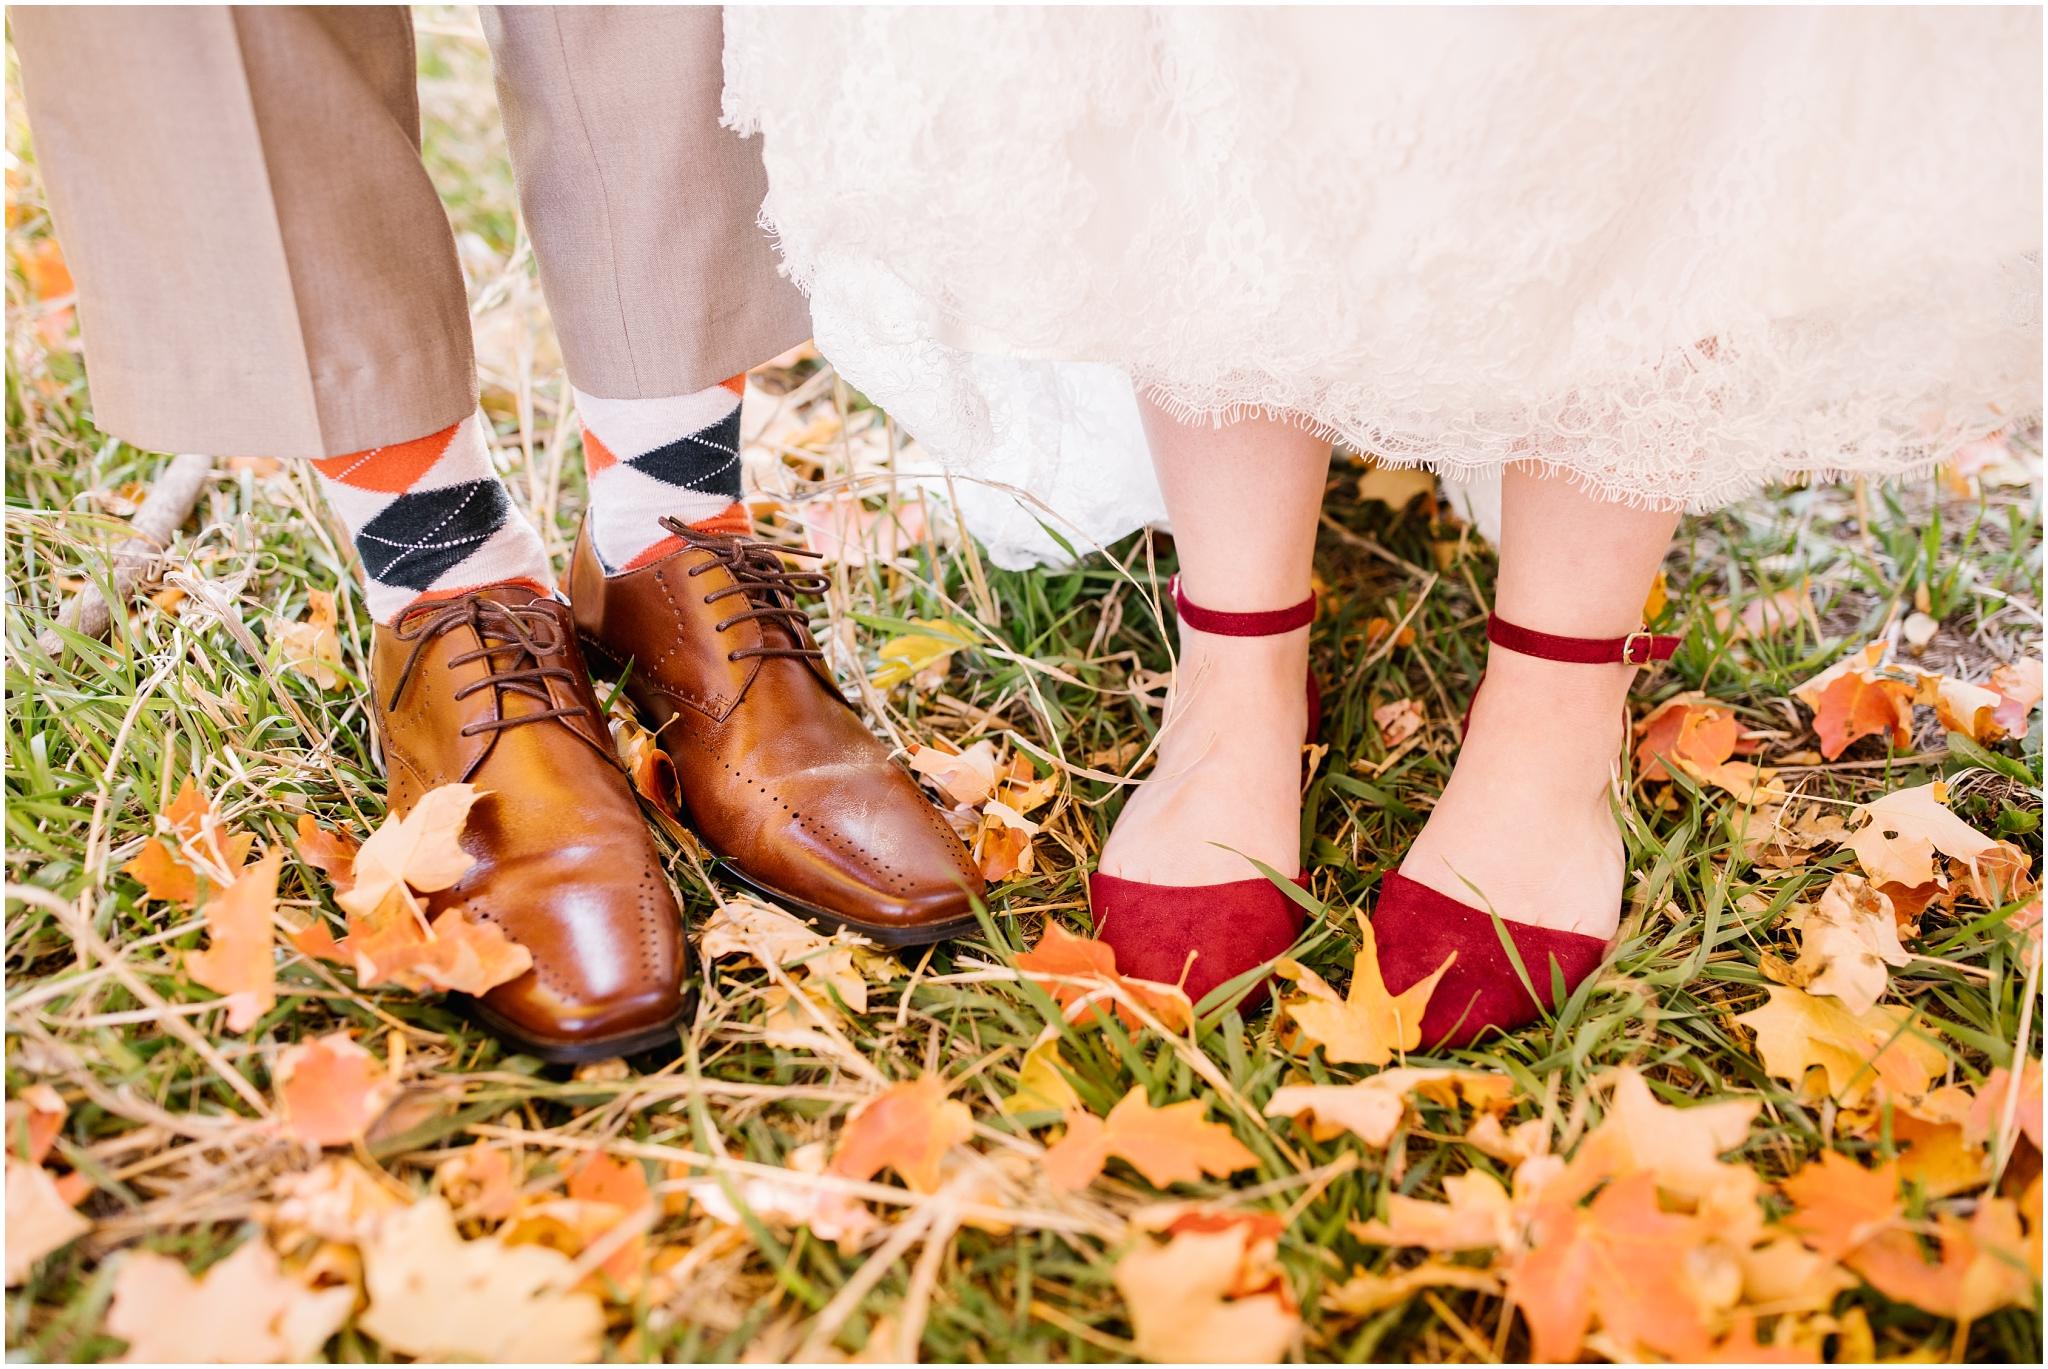 HE-BRIDALS-45_Lizzie-B-Imagery-Utah-Wedding-Photographer-Central-Utah-Park-City-Salt-Lake-City-Hobble-Creek-Canyon-Springville.jpg